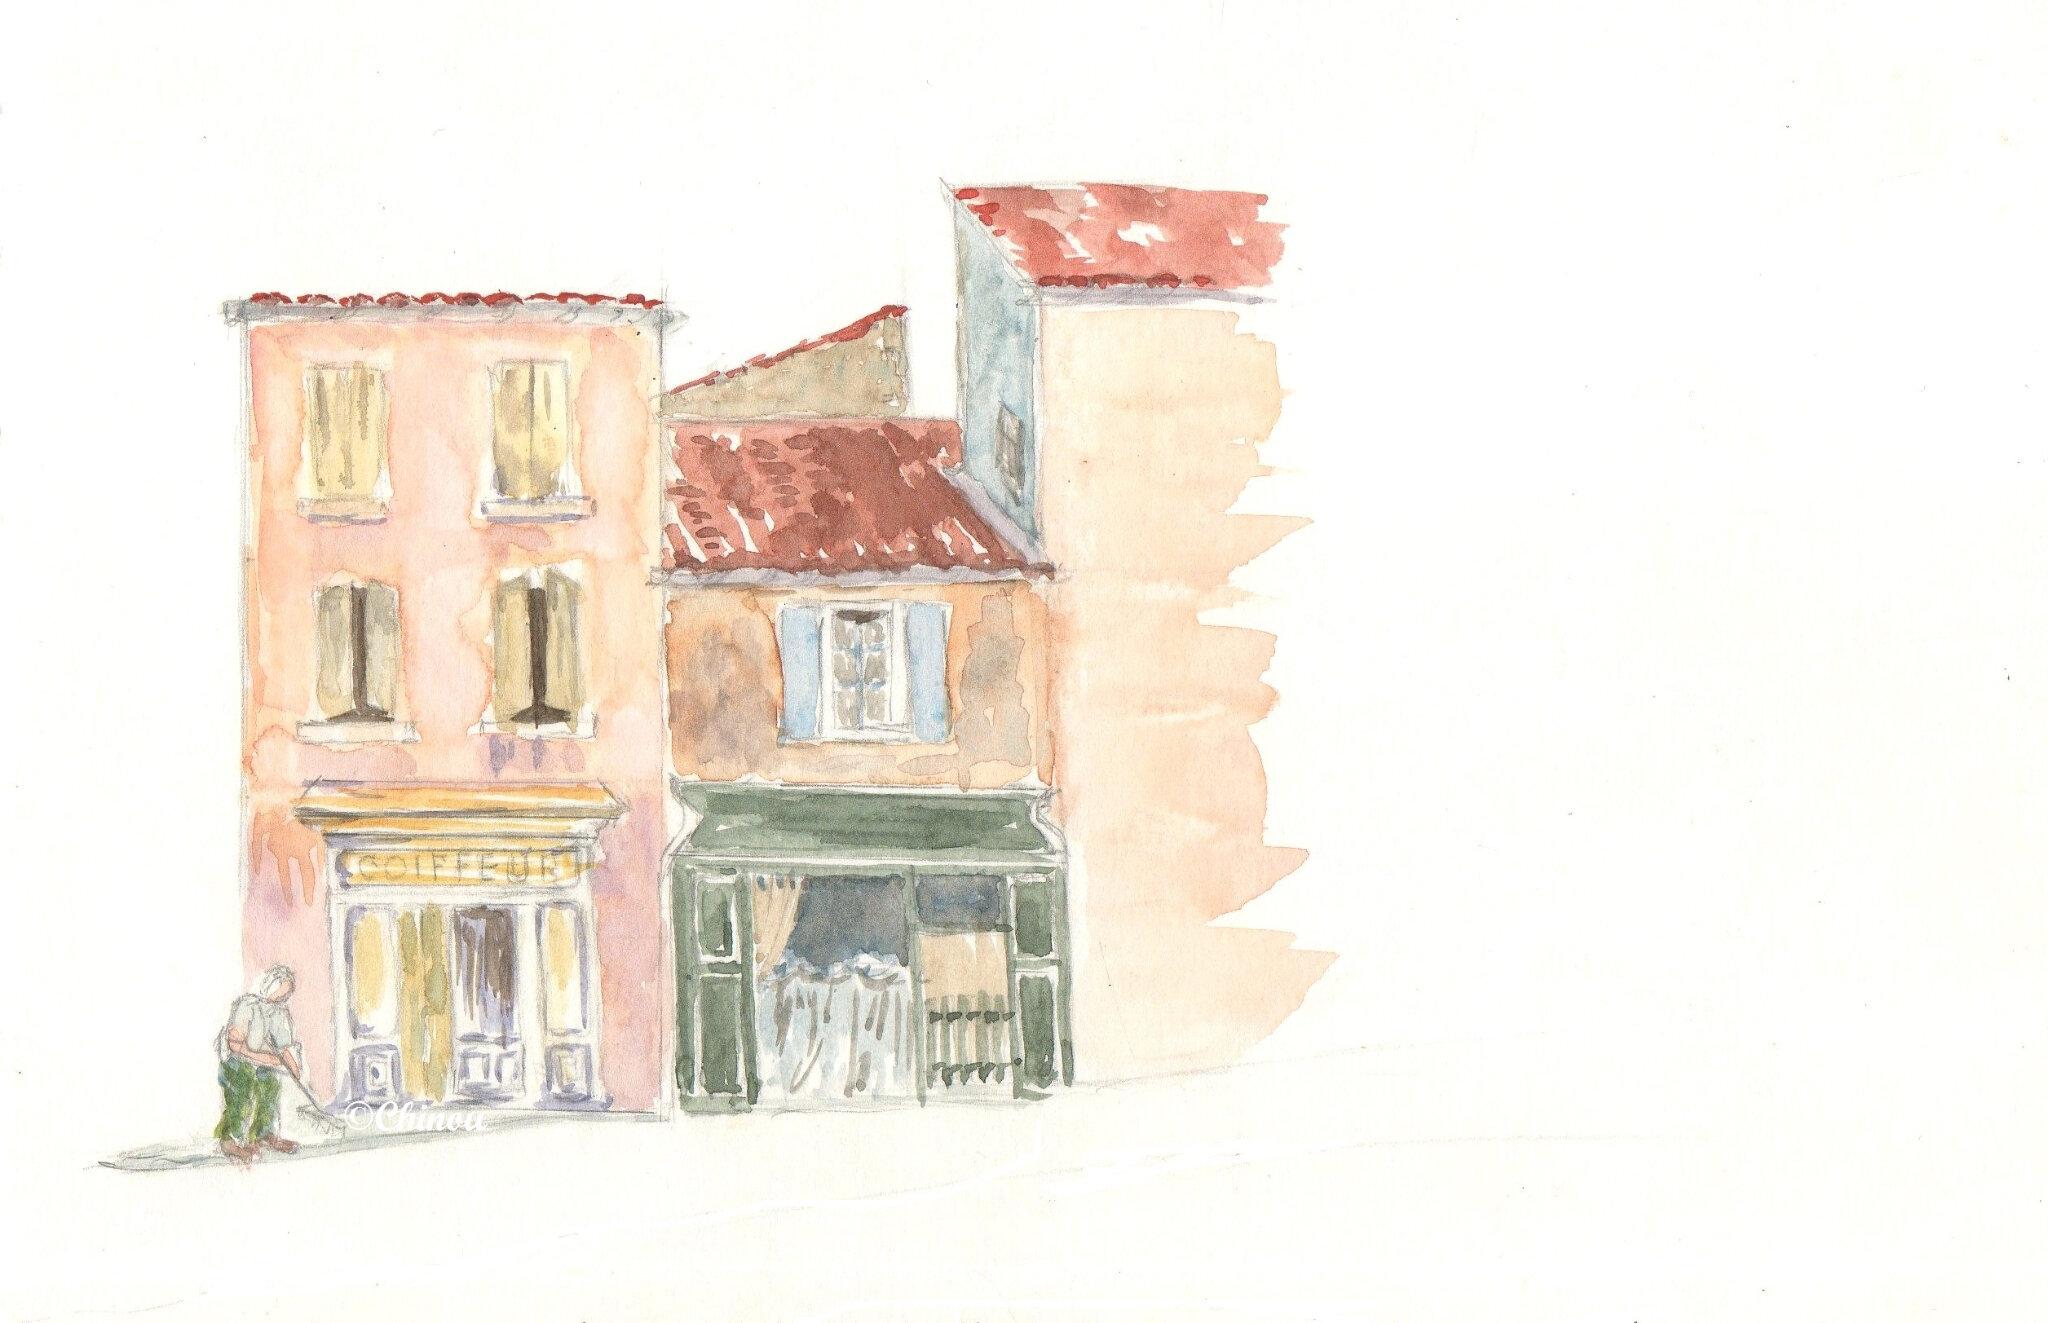 St Rémy de Provence